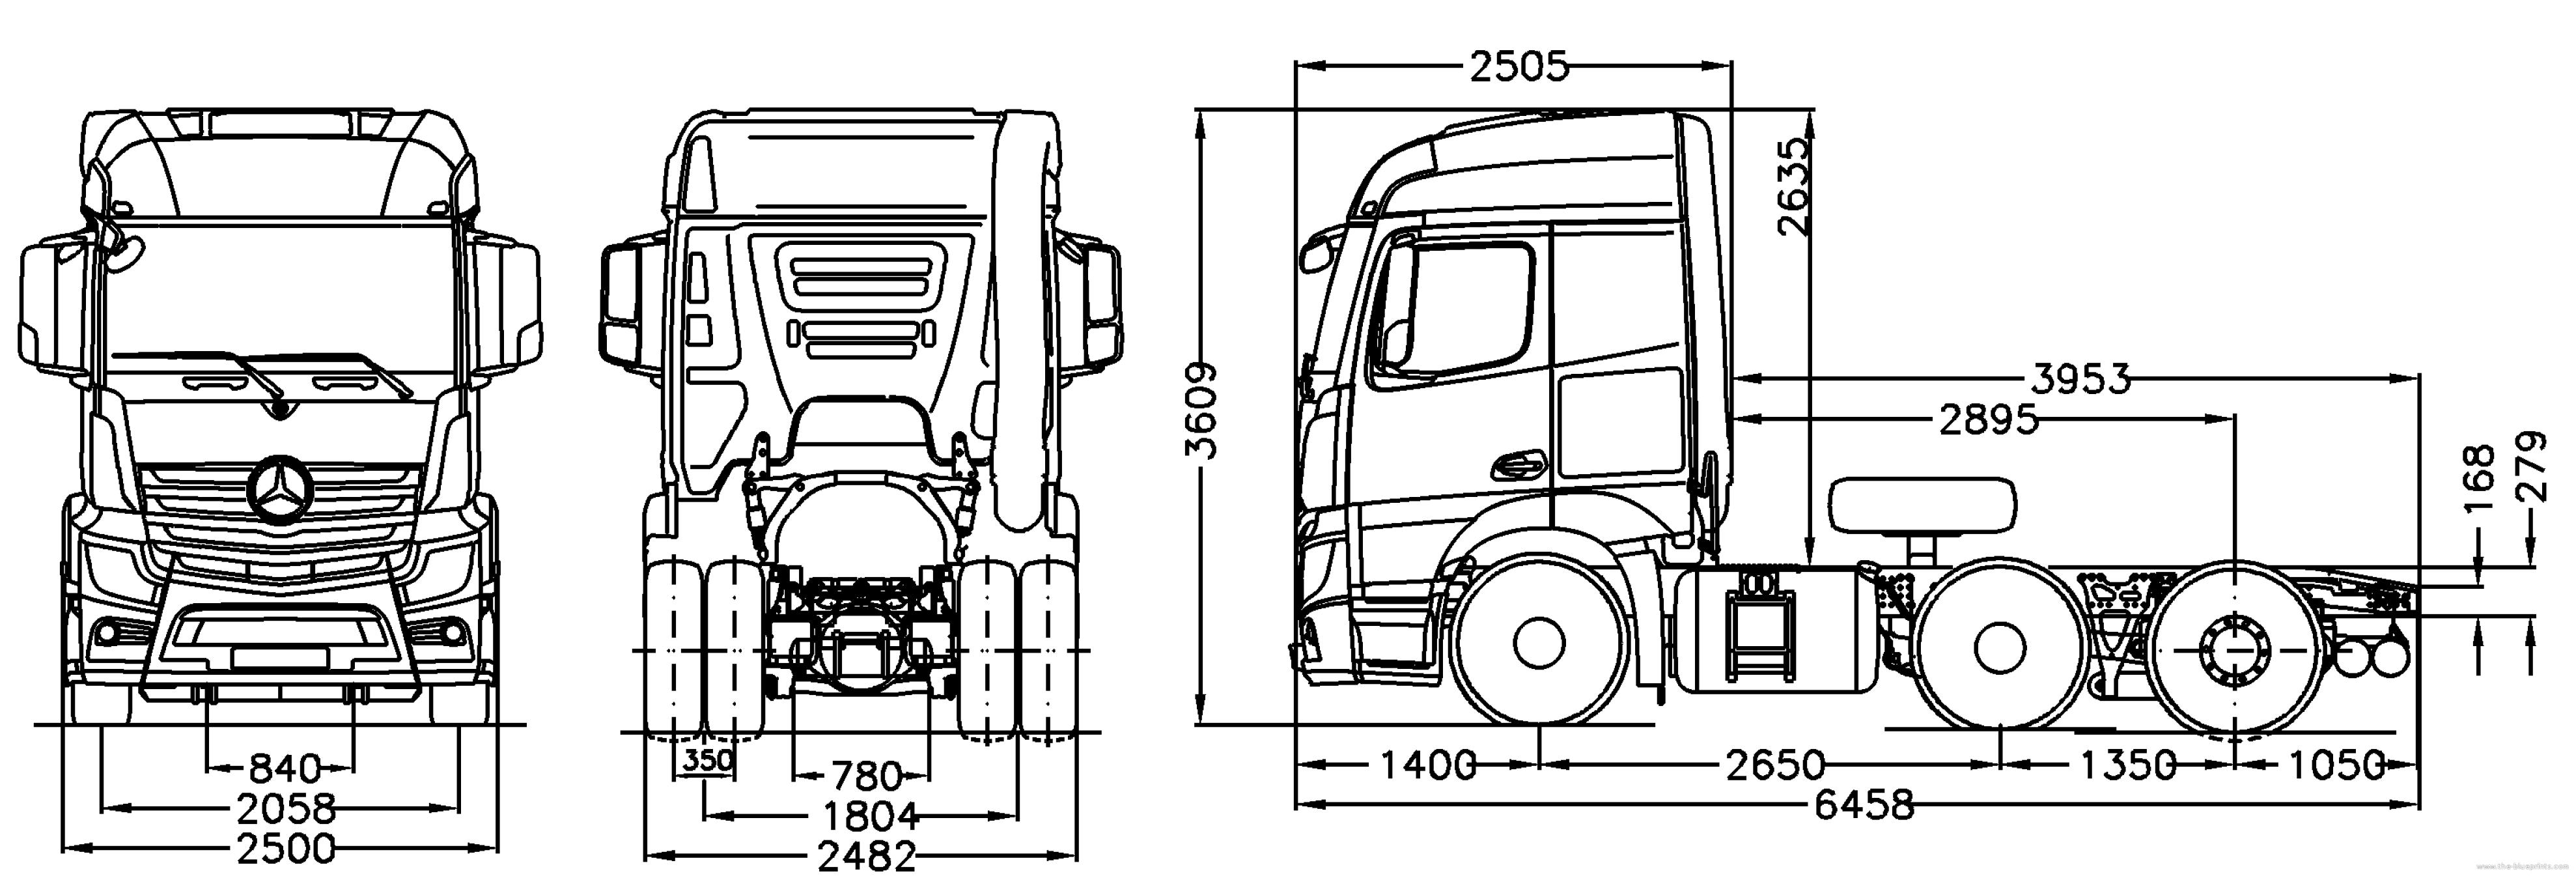 blueprints trucks mercedes benz mercedes benz actros 4x2 stream space semi trailer tractor. Black Bedroom Furniture Sets. Home Design Ideas